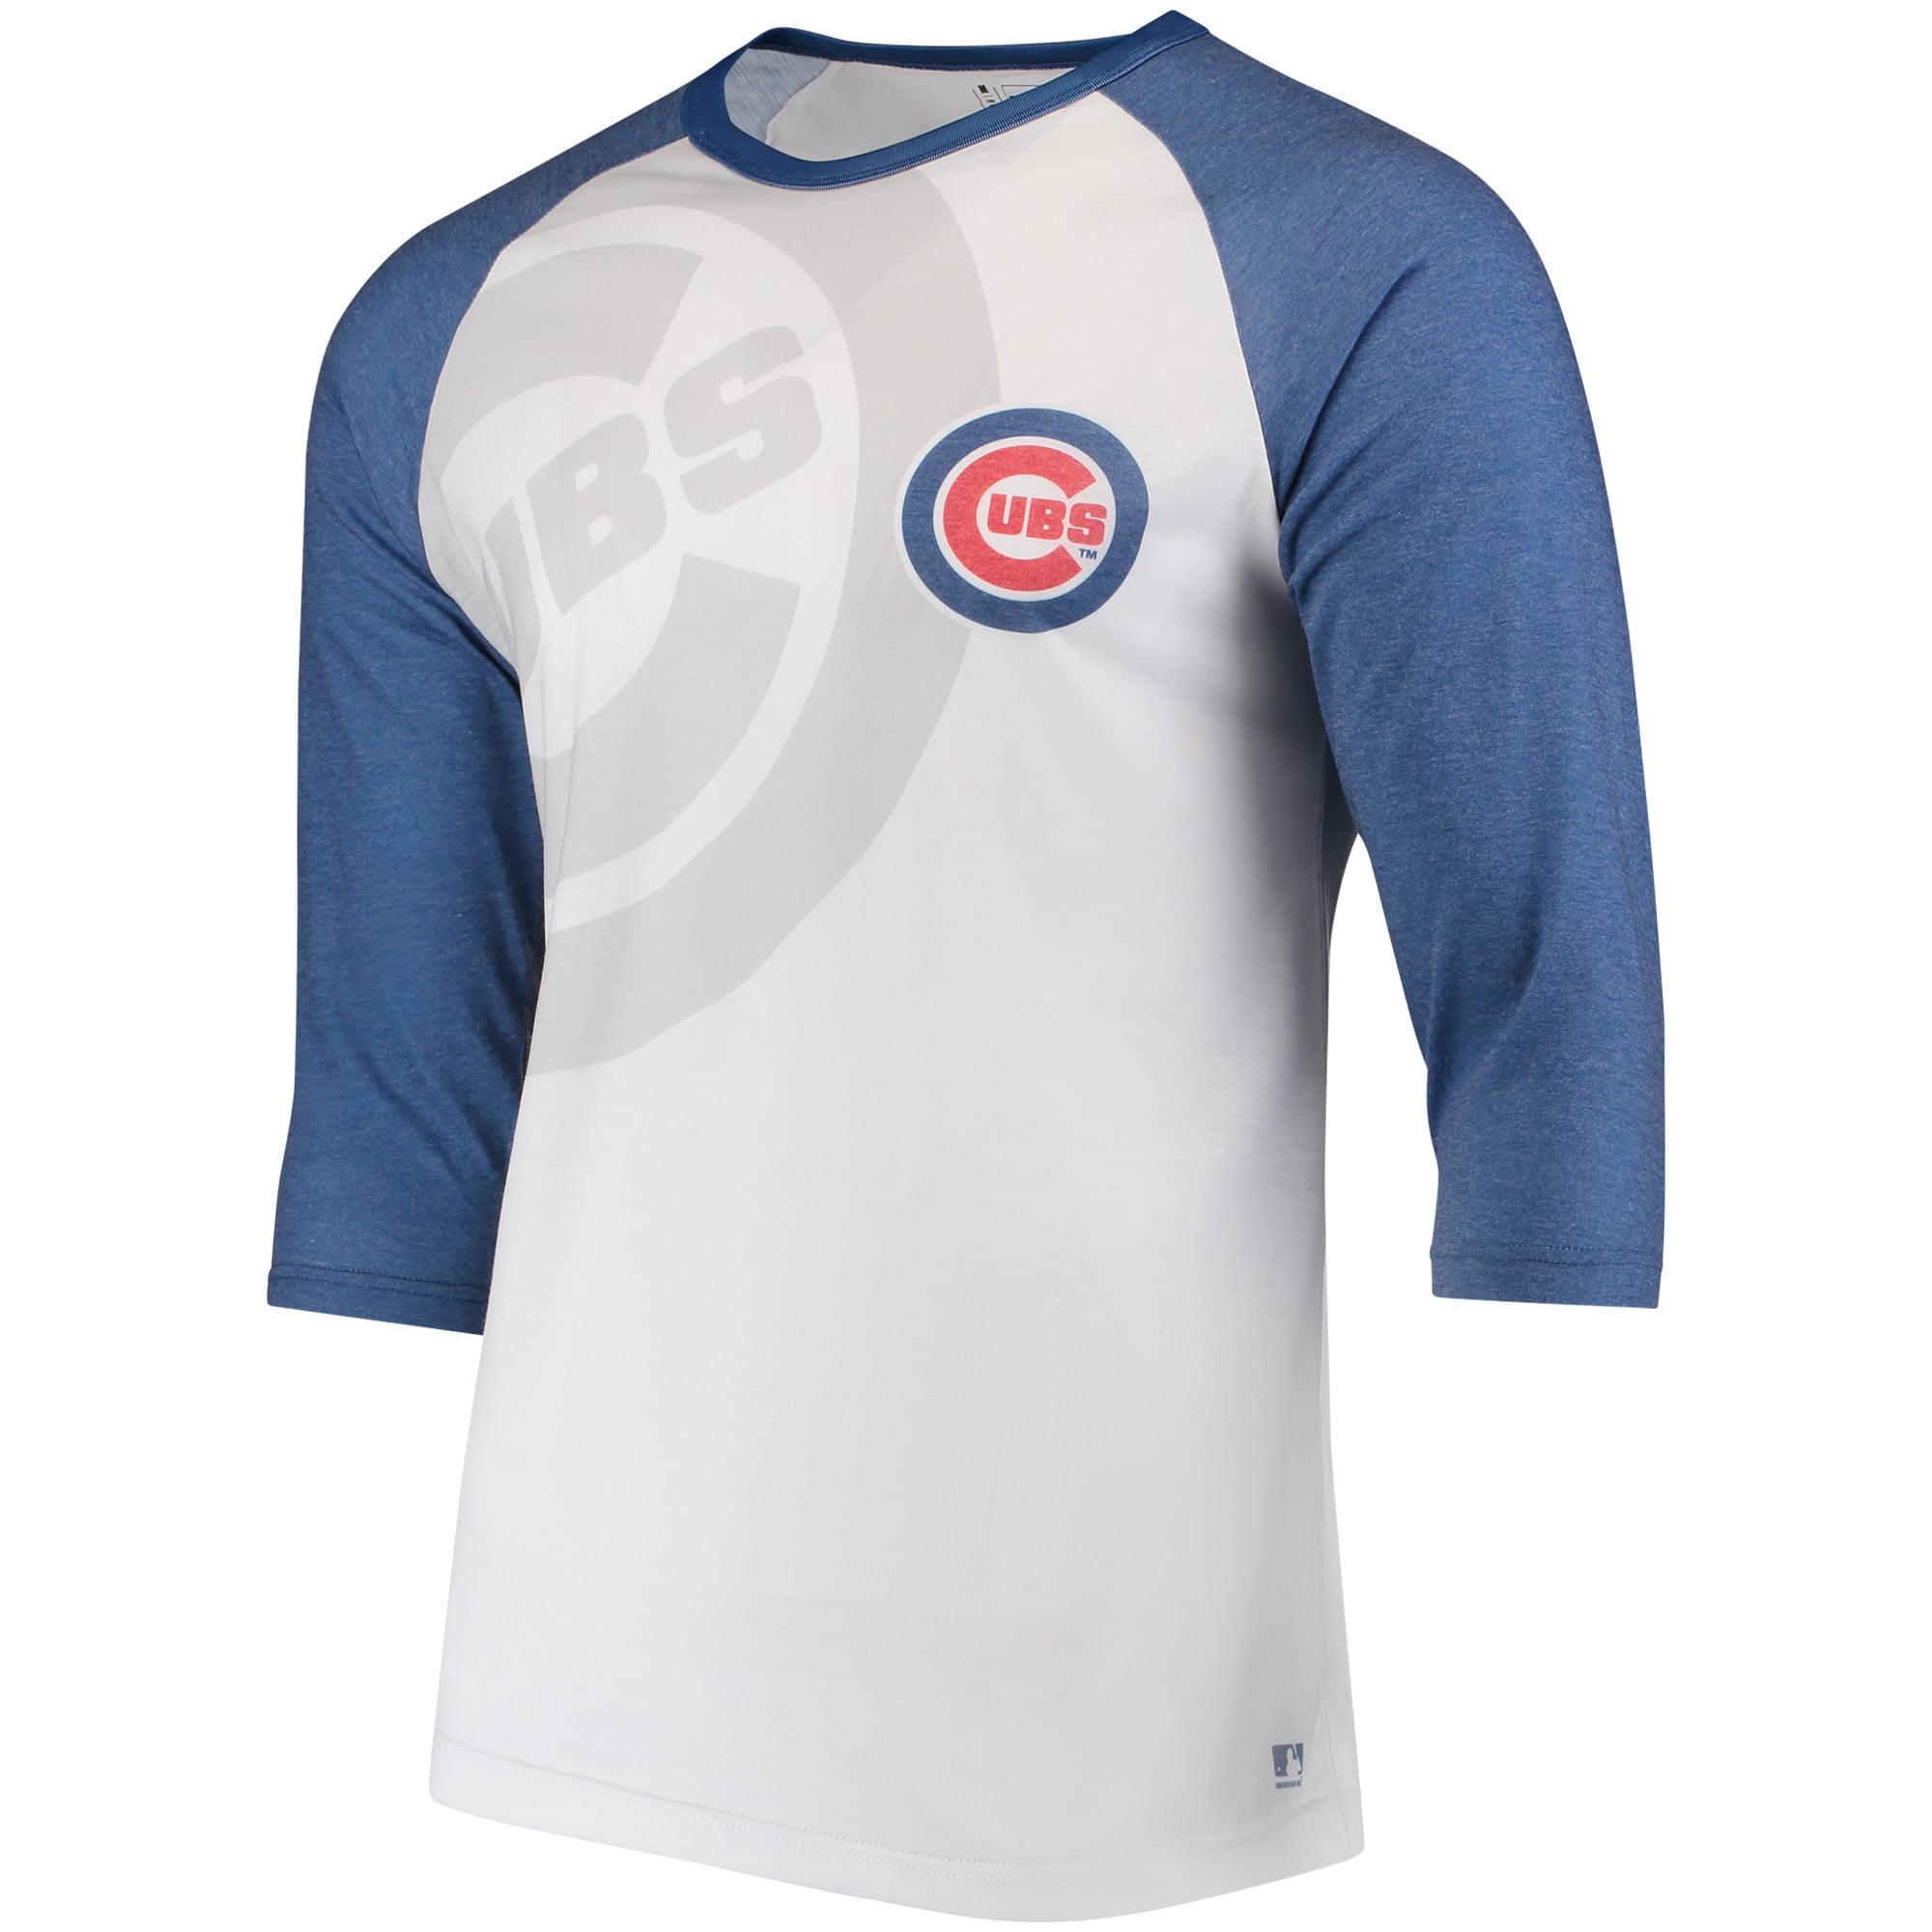 Chicago Cubs Baseball 3/4-Sleeve Raglan T-Shirt - White/Royal